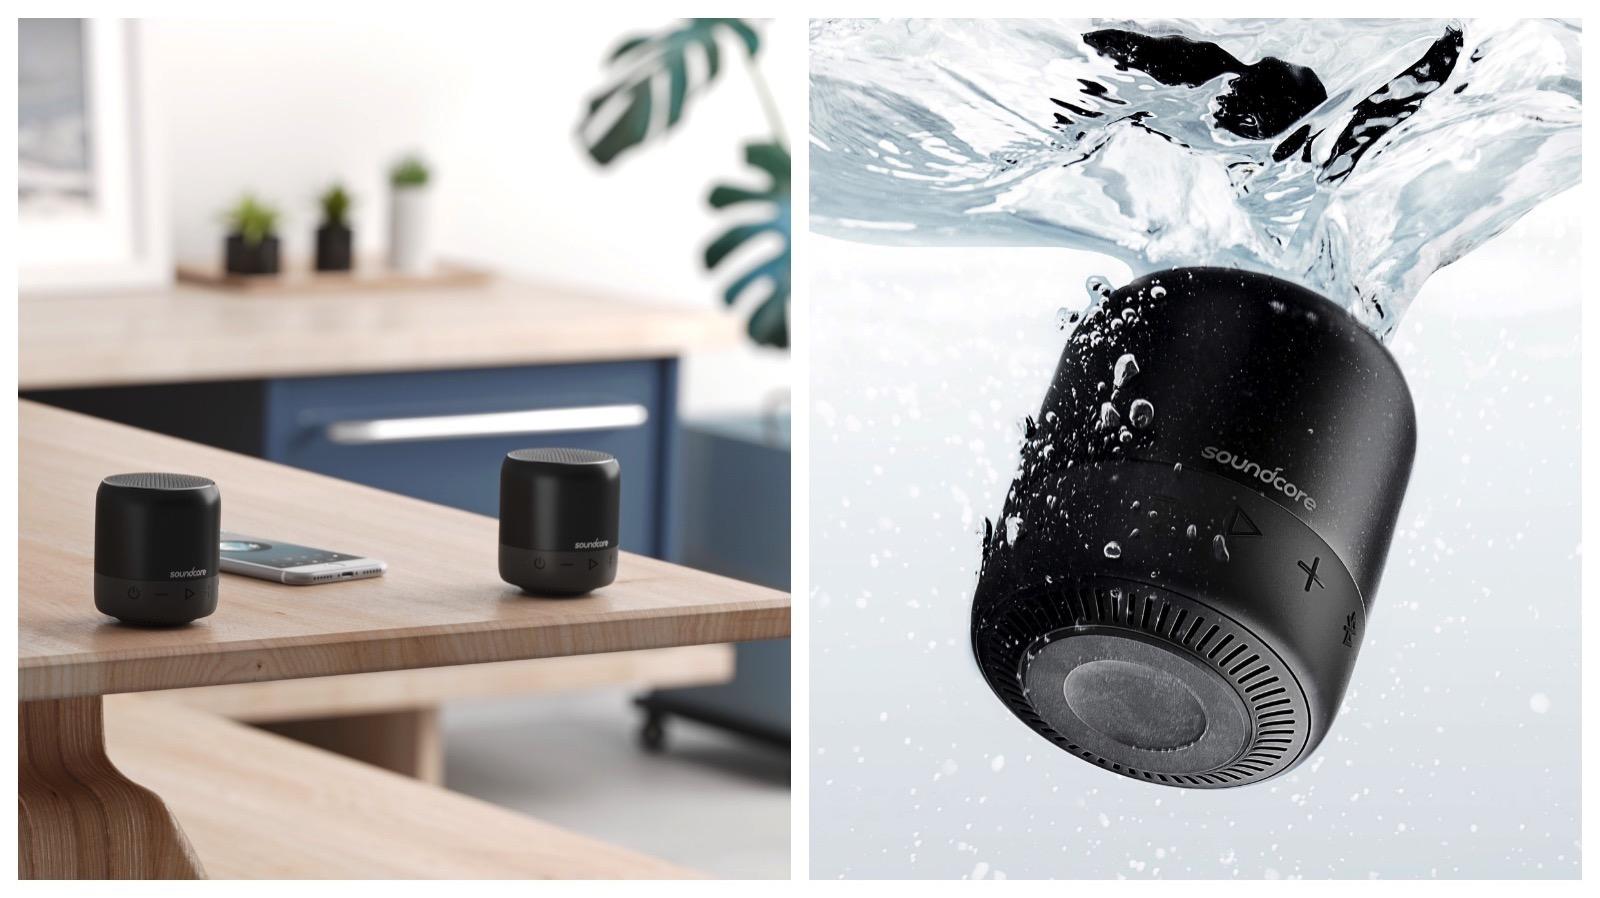 Soundcore-Mini-2-Stereo-and-Waterproof.jpg